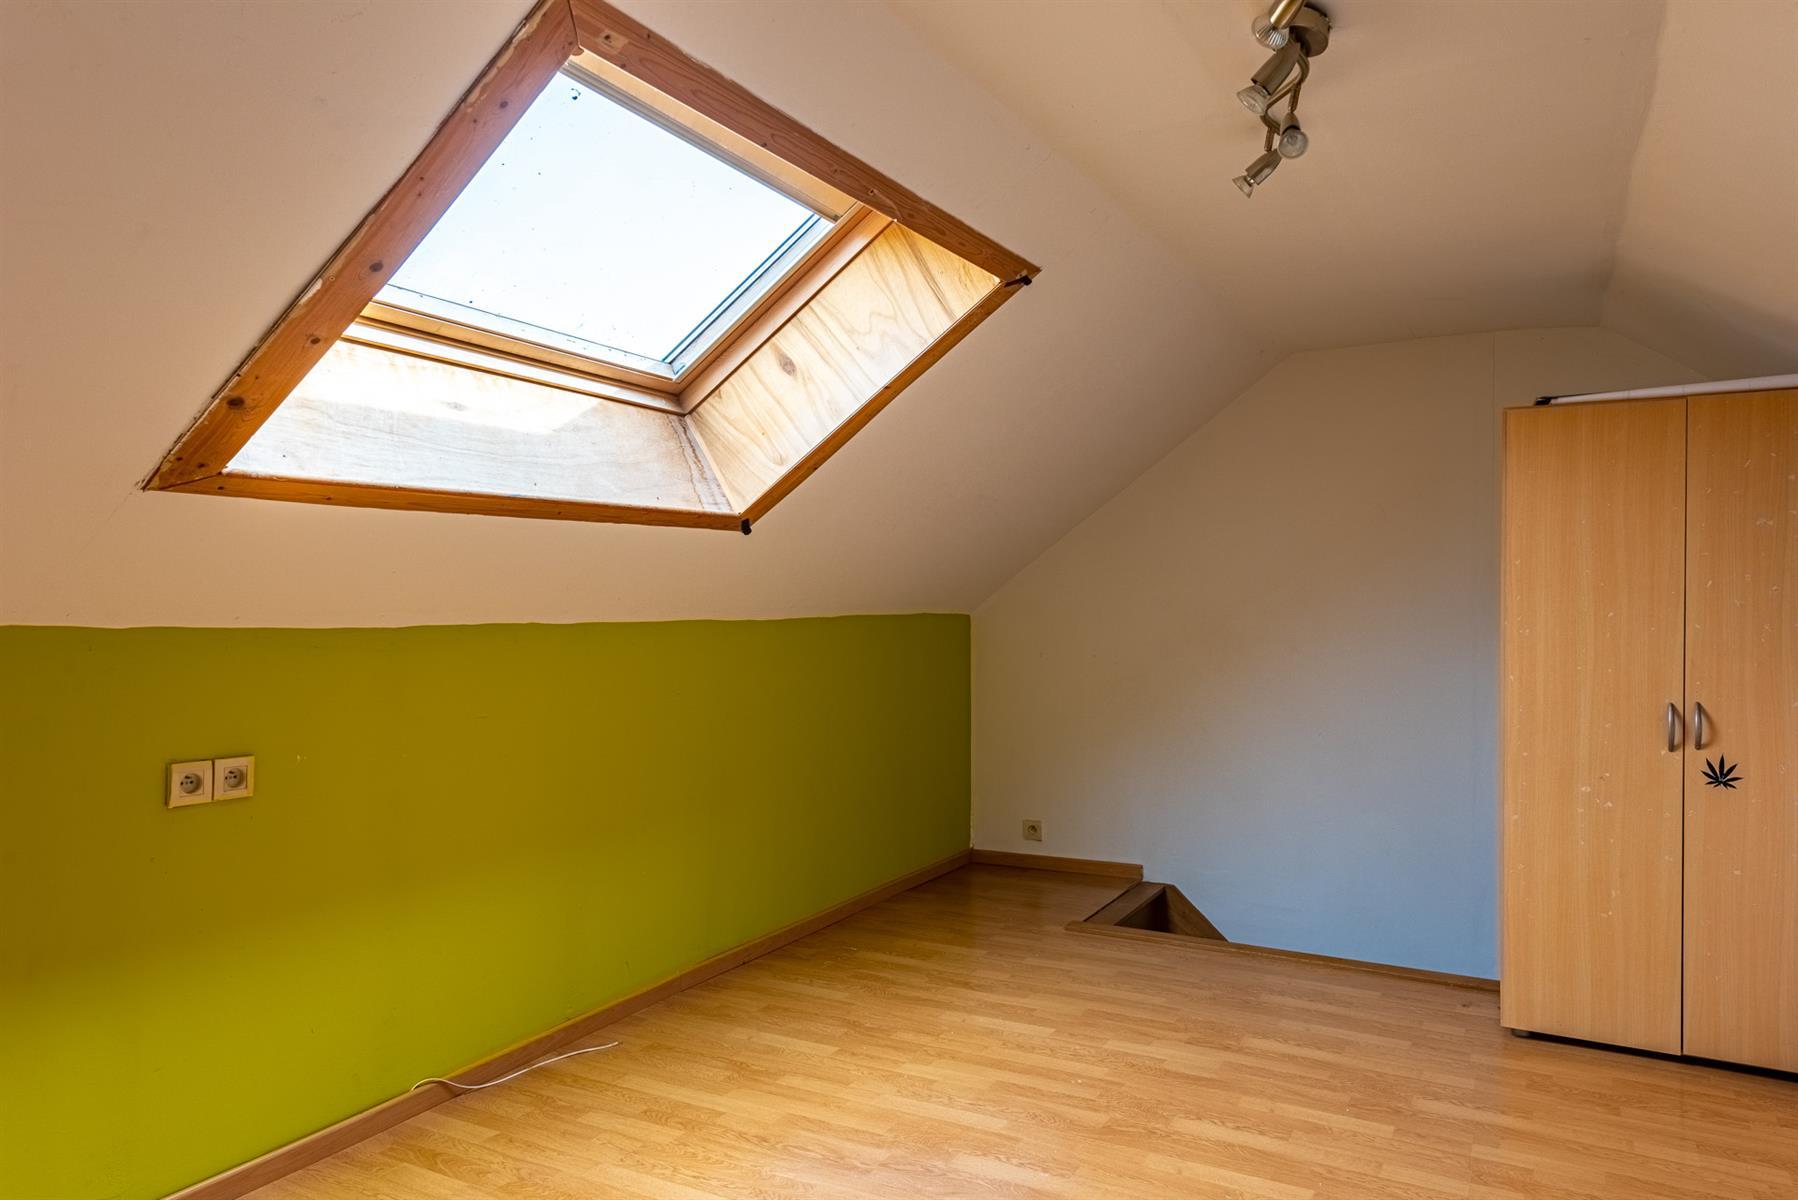 Maison - Houyet Wanlin - #4496629-17